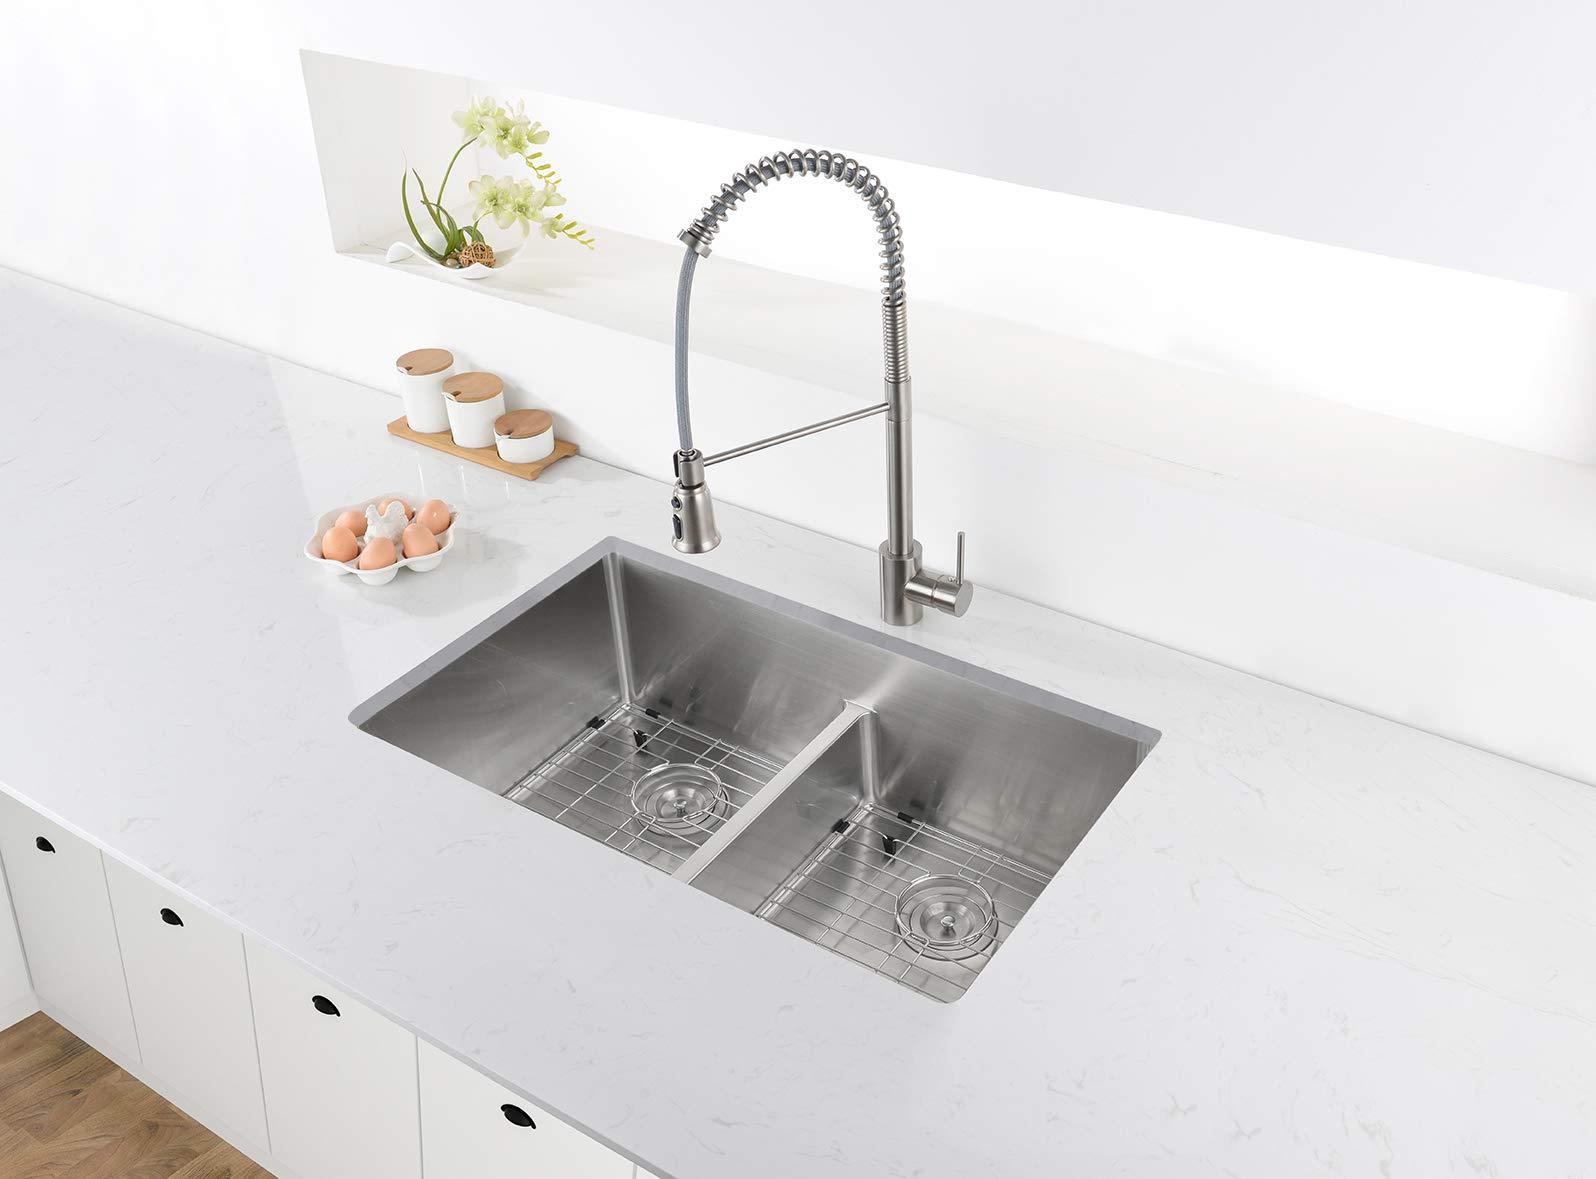 Ruvati 32-inch Low-Divide Undermount Tight Radius 50/50 Double Bowl 16 Gauge Stainless Steel Kitchen Sink - RVH7411 by Ruvati (Image #4)